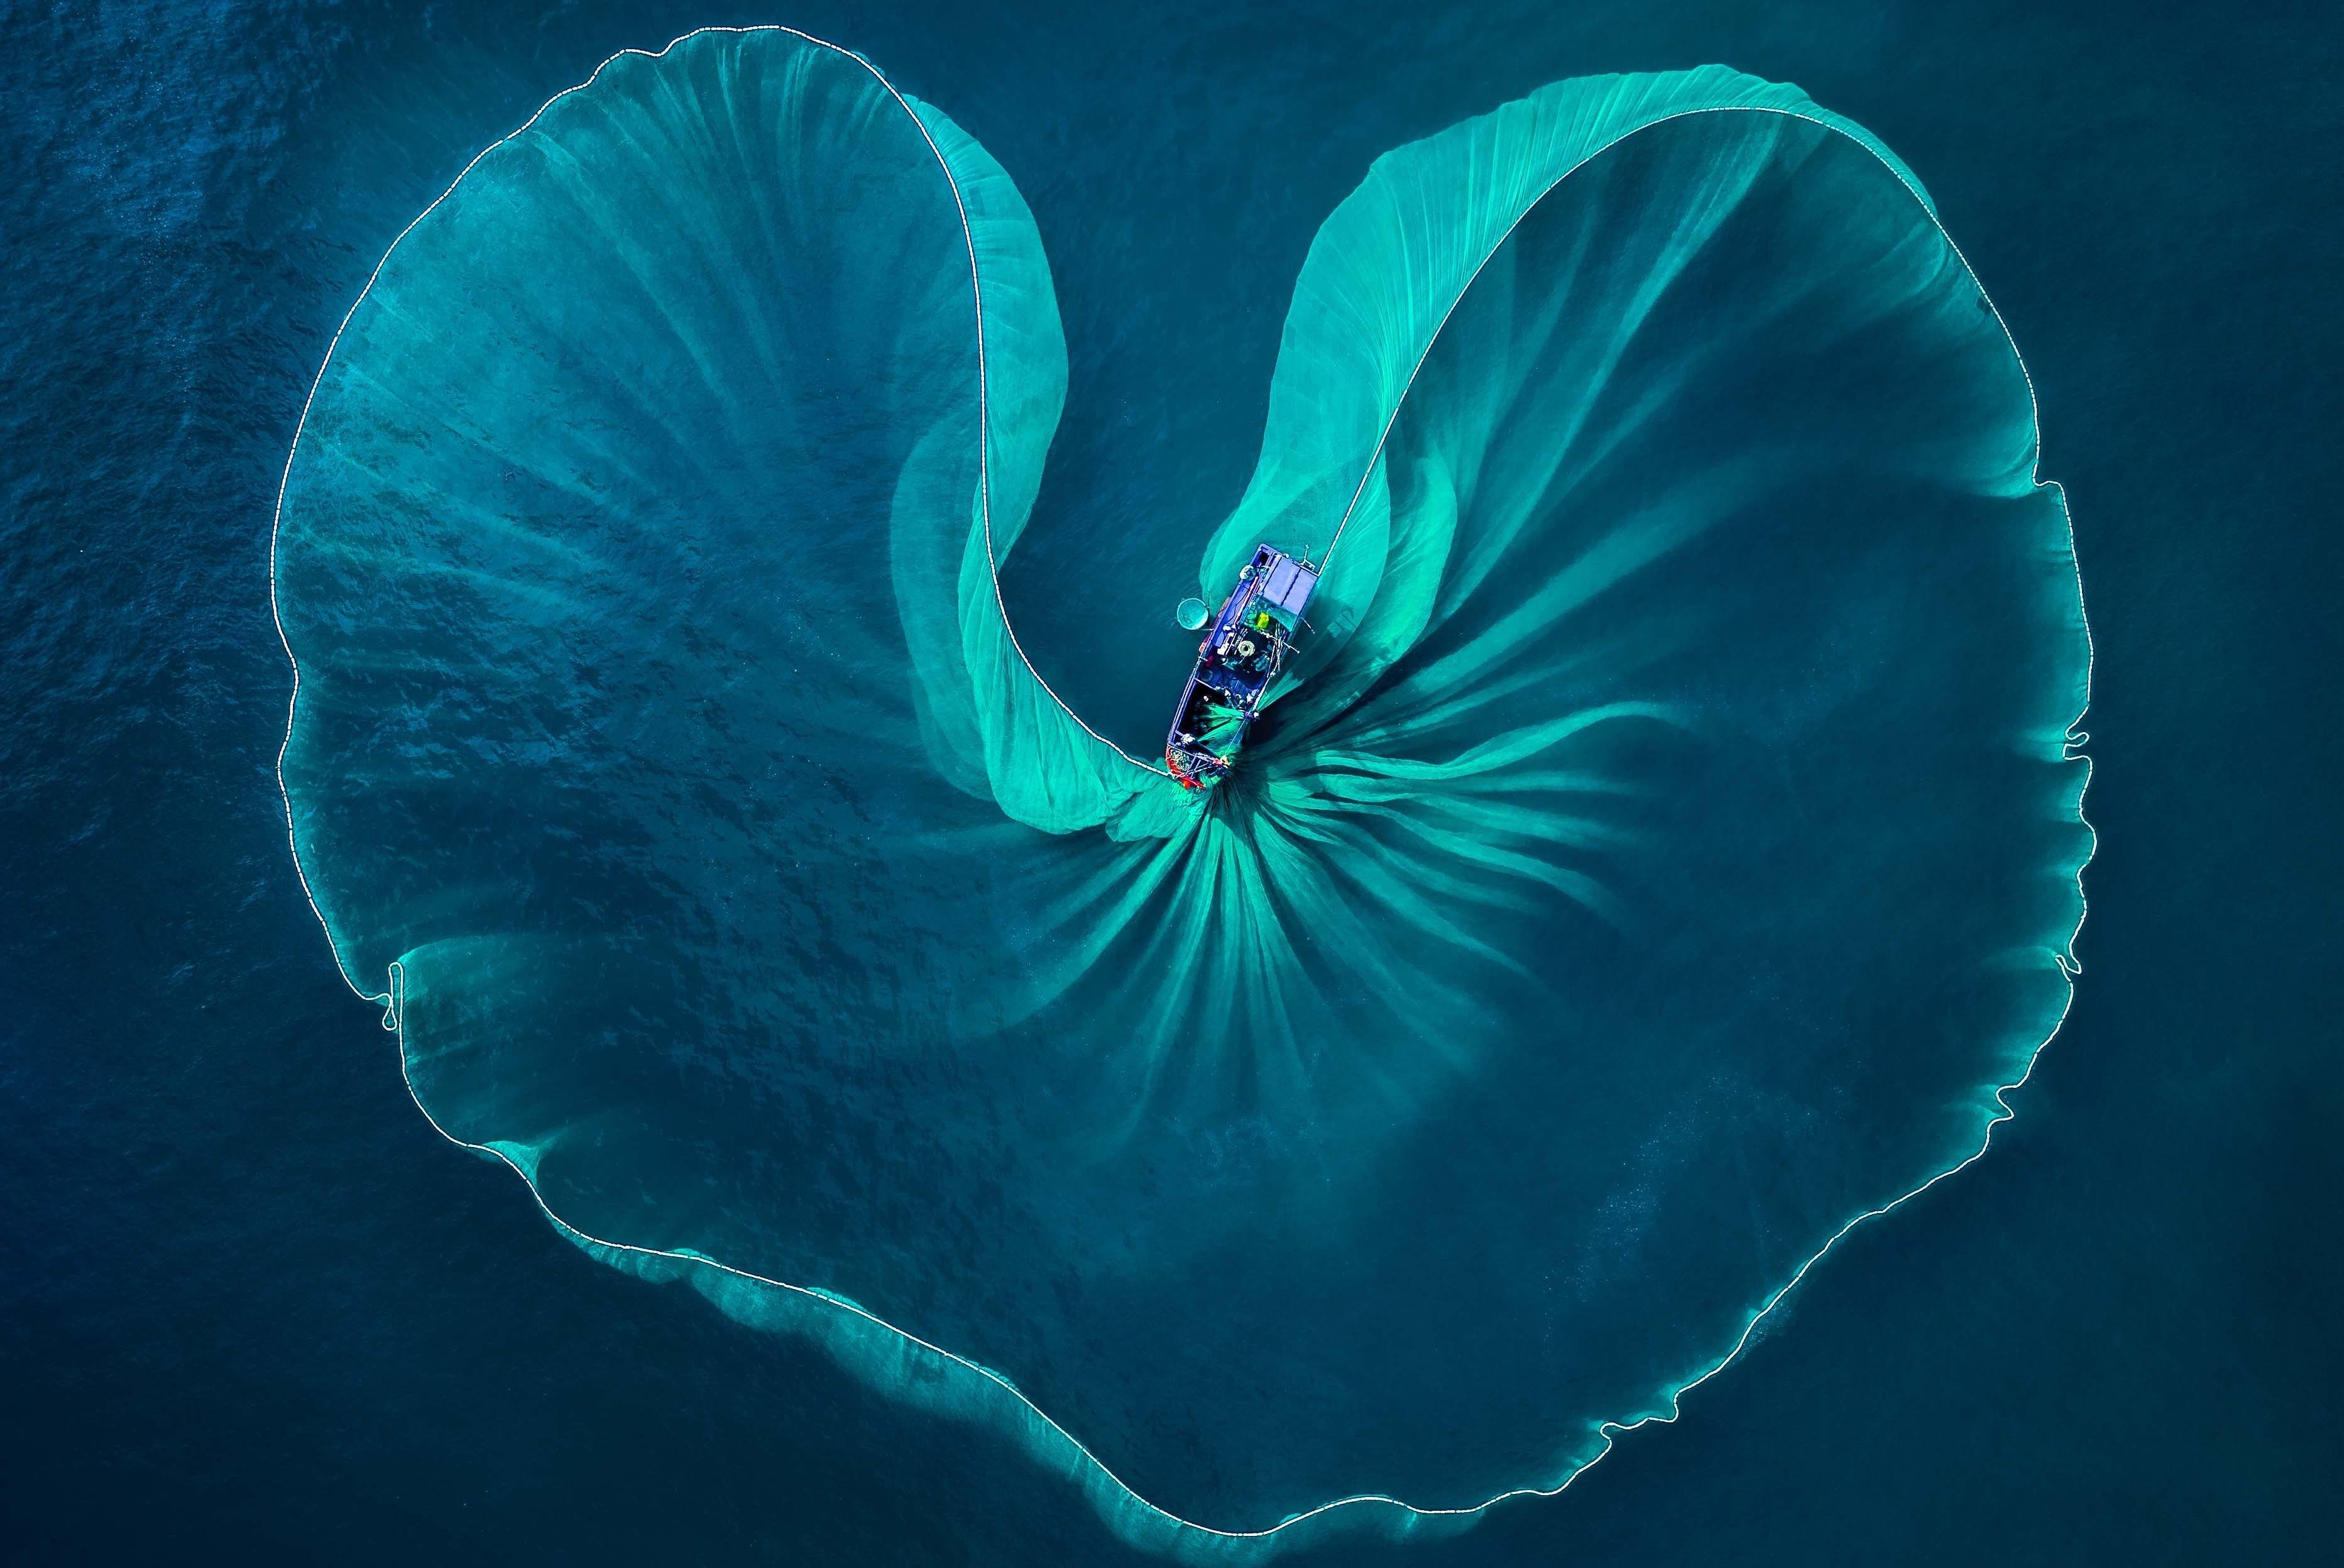 Photo exhibition showcasing Vietnam's beauty hinh anh 1